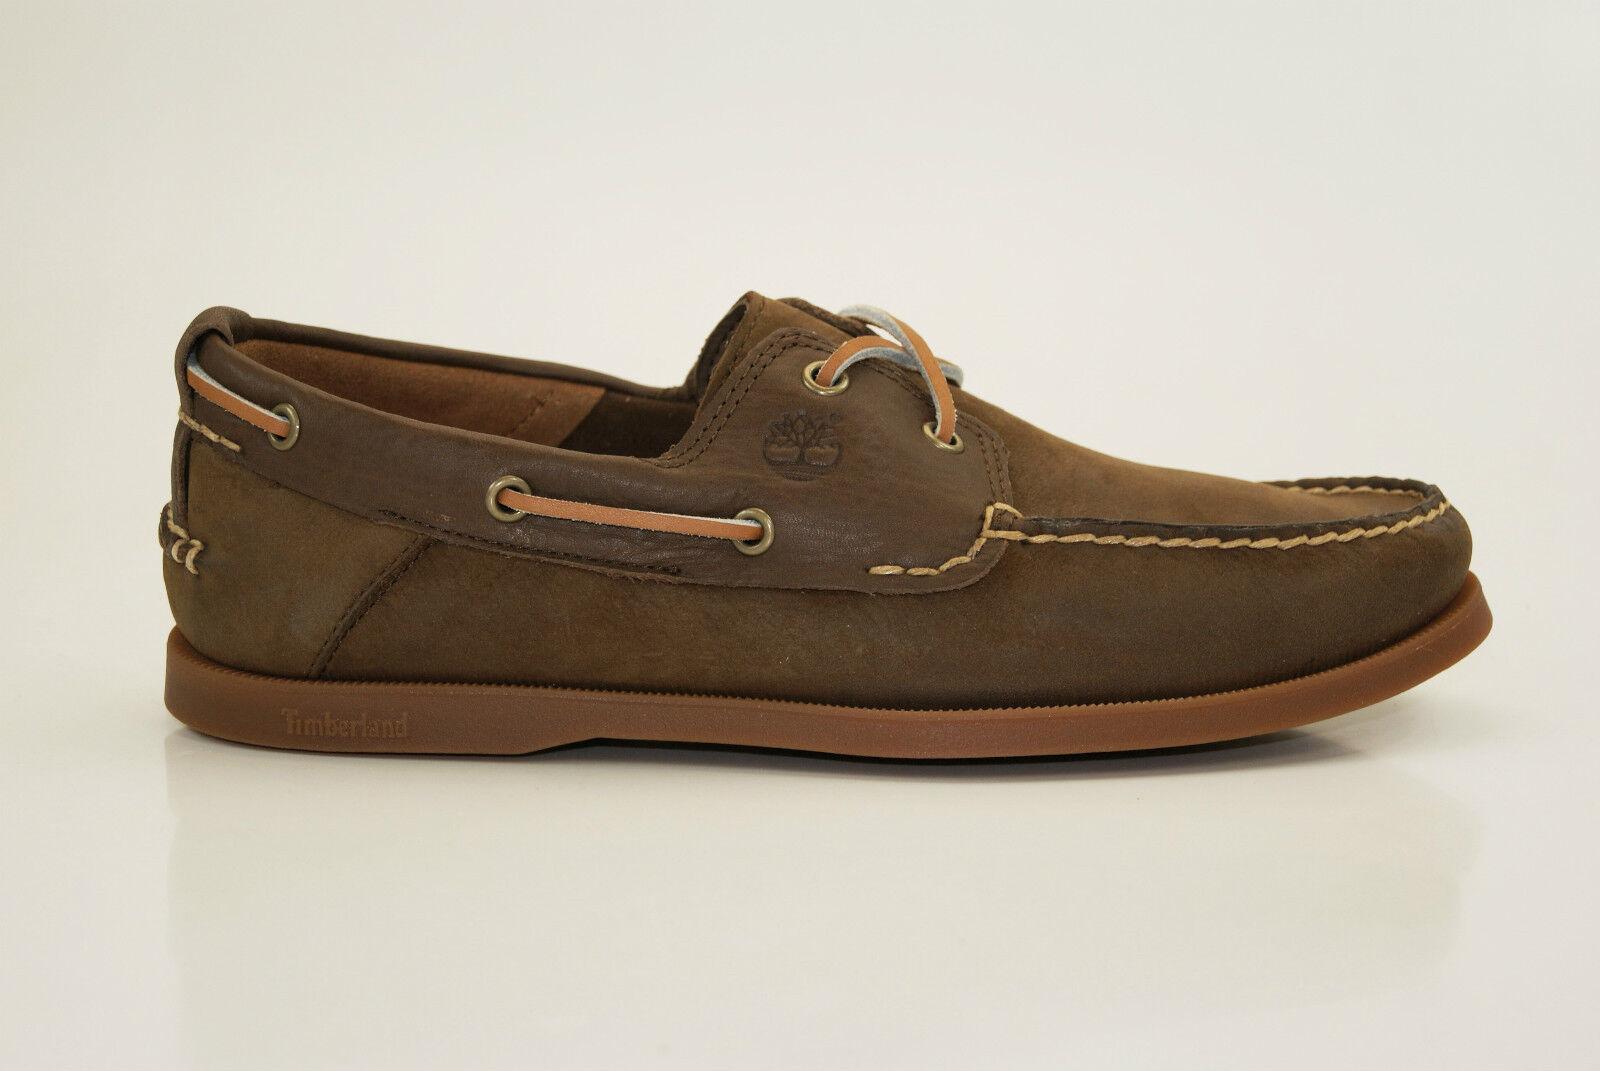 ... Timberland Heritage 2-eye boat scarpe scarpe scarpe da vela barca scarpe  scarpe scarpe uomo ... 91cc2c939c1